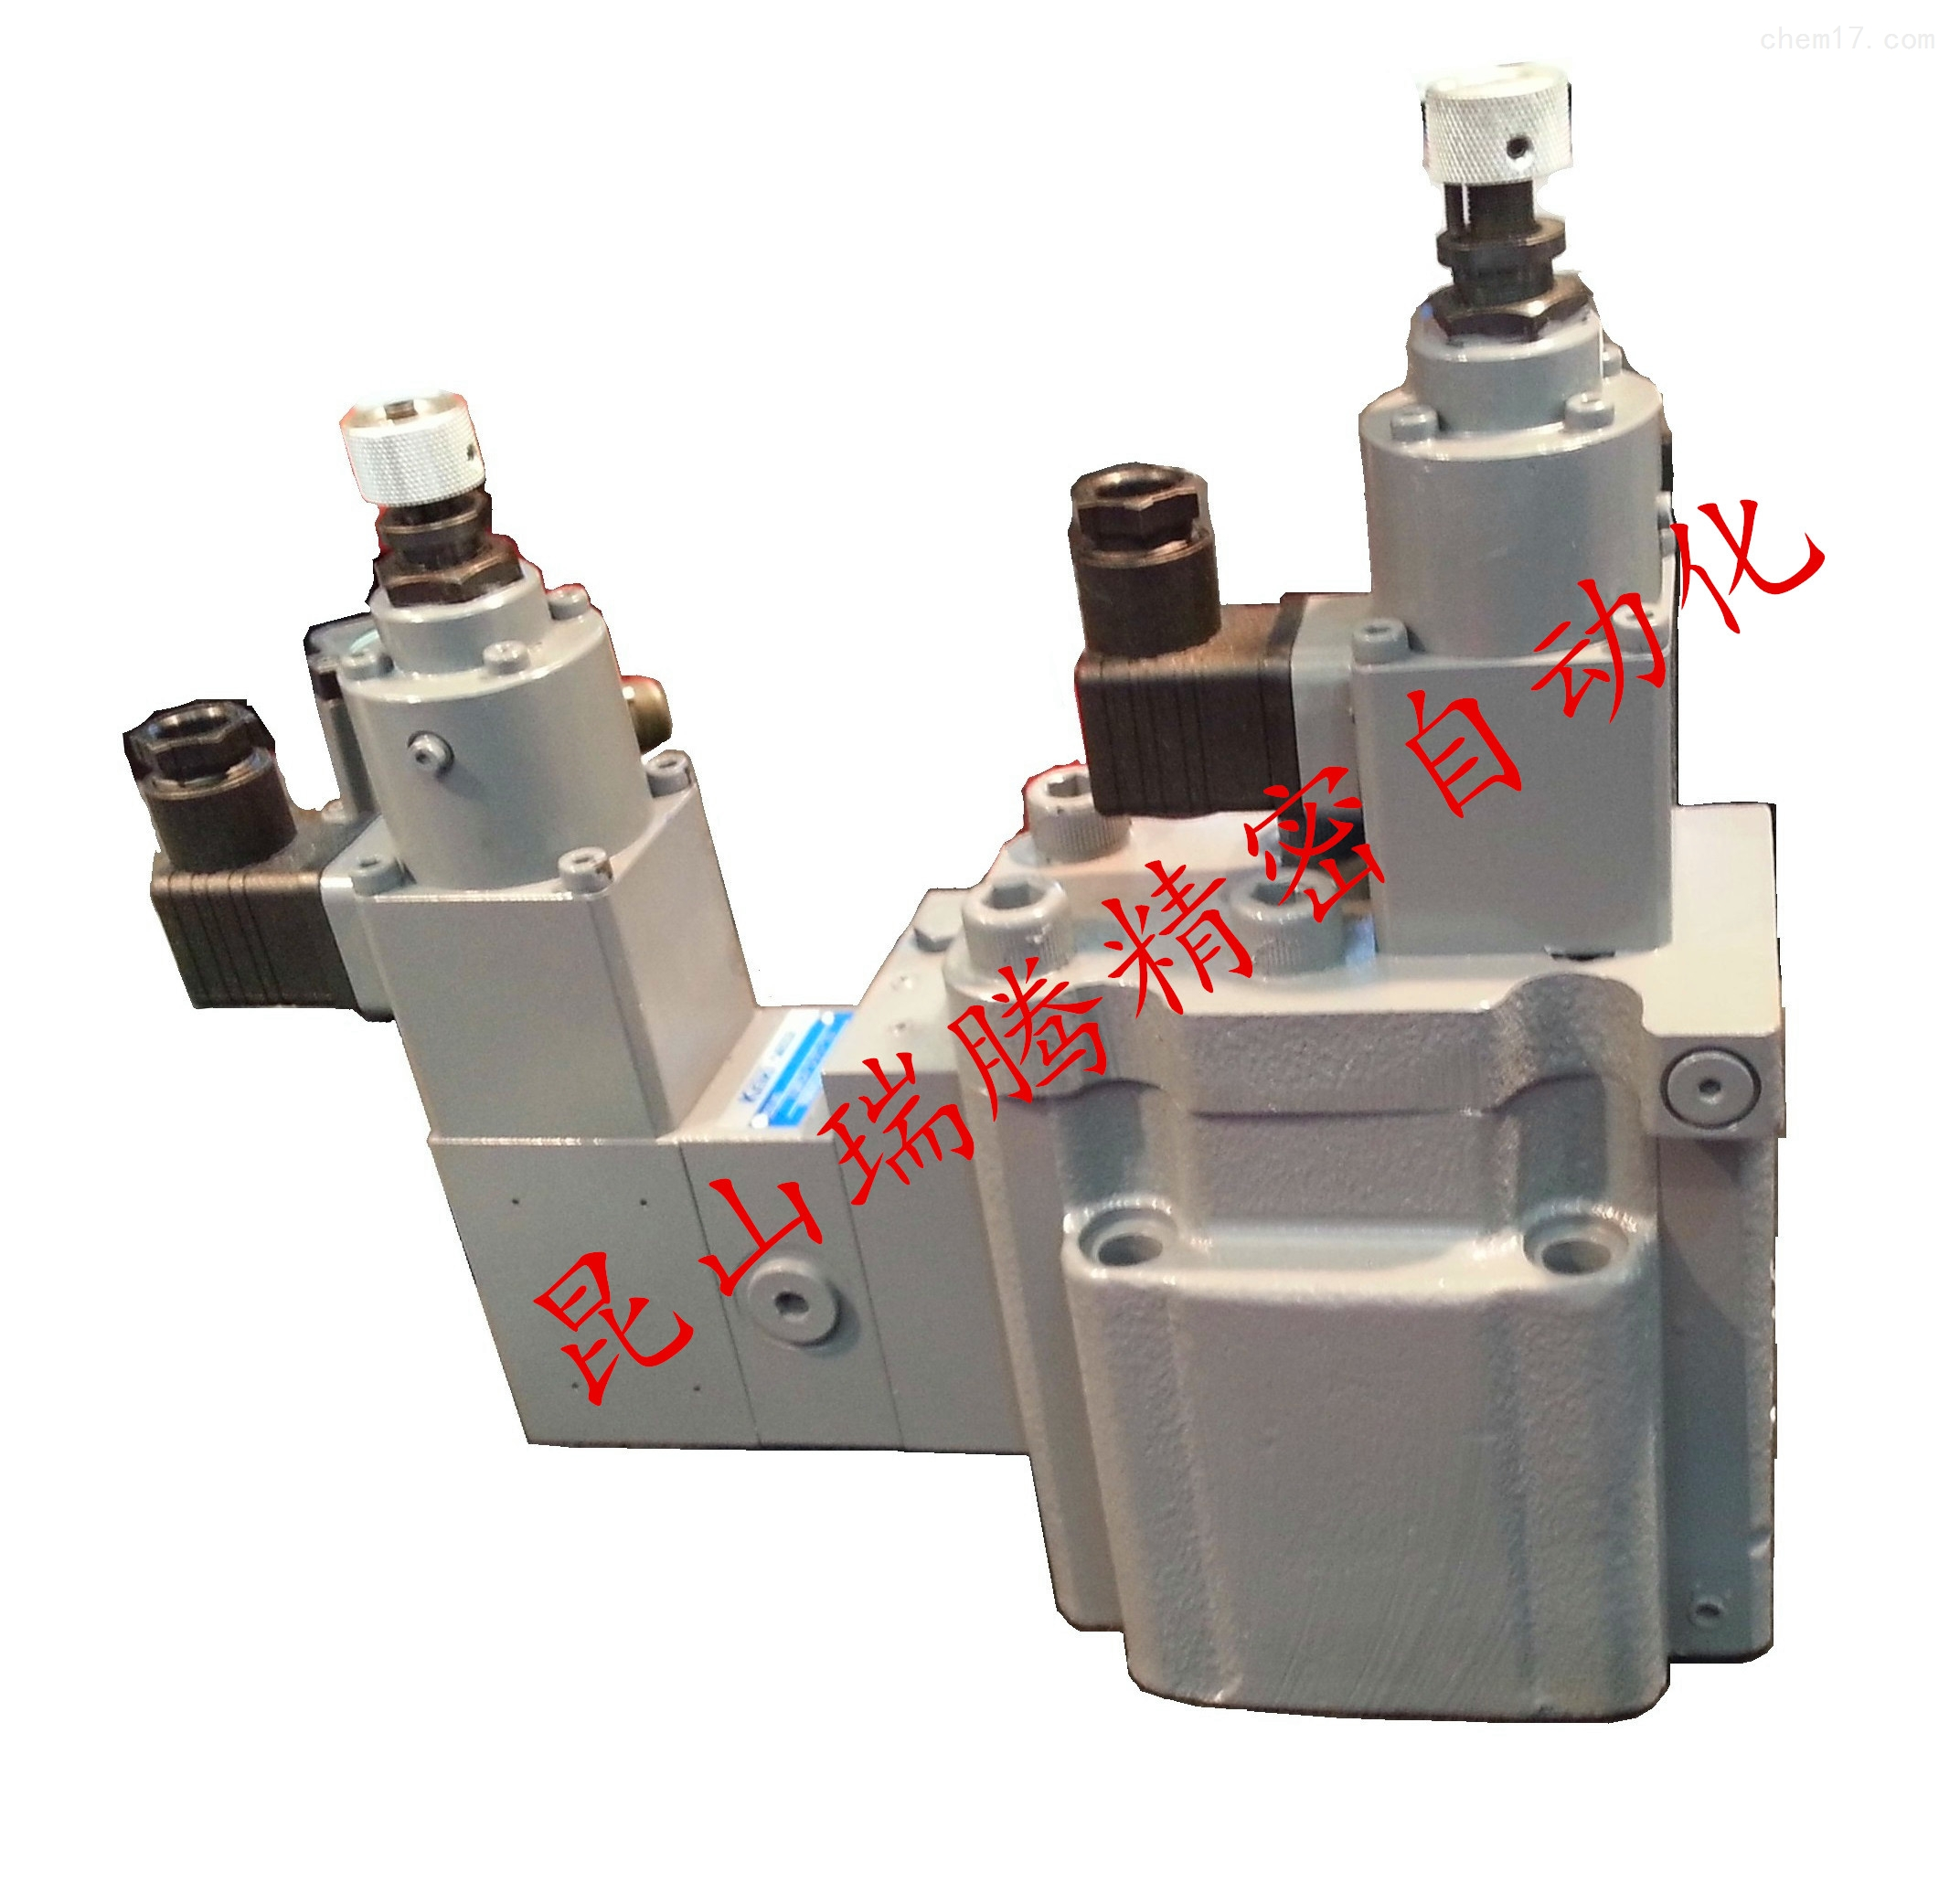 EPFRCG-H02-175-100-EX-10-TN-S3 比例流量控制阀